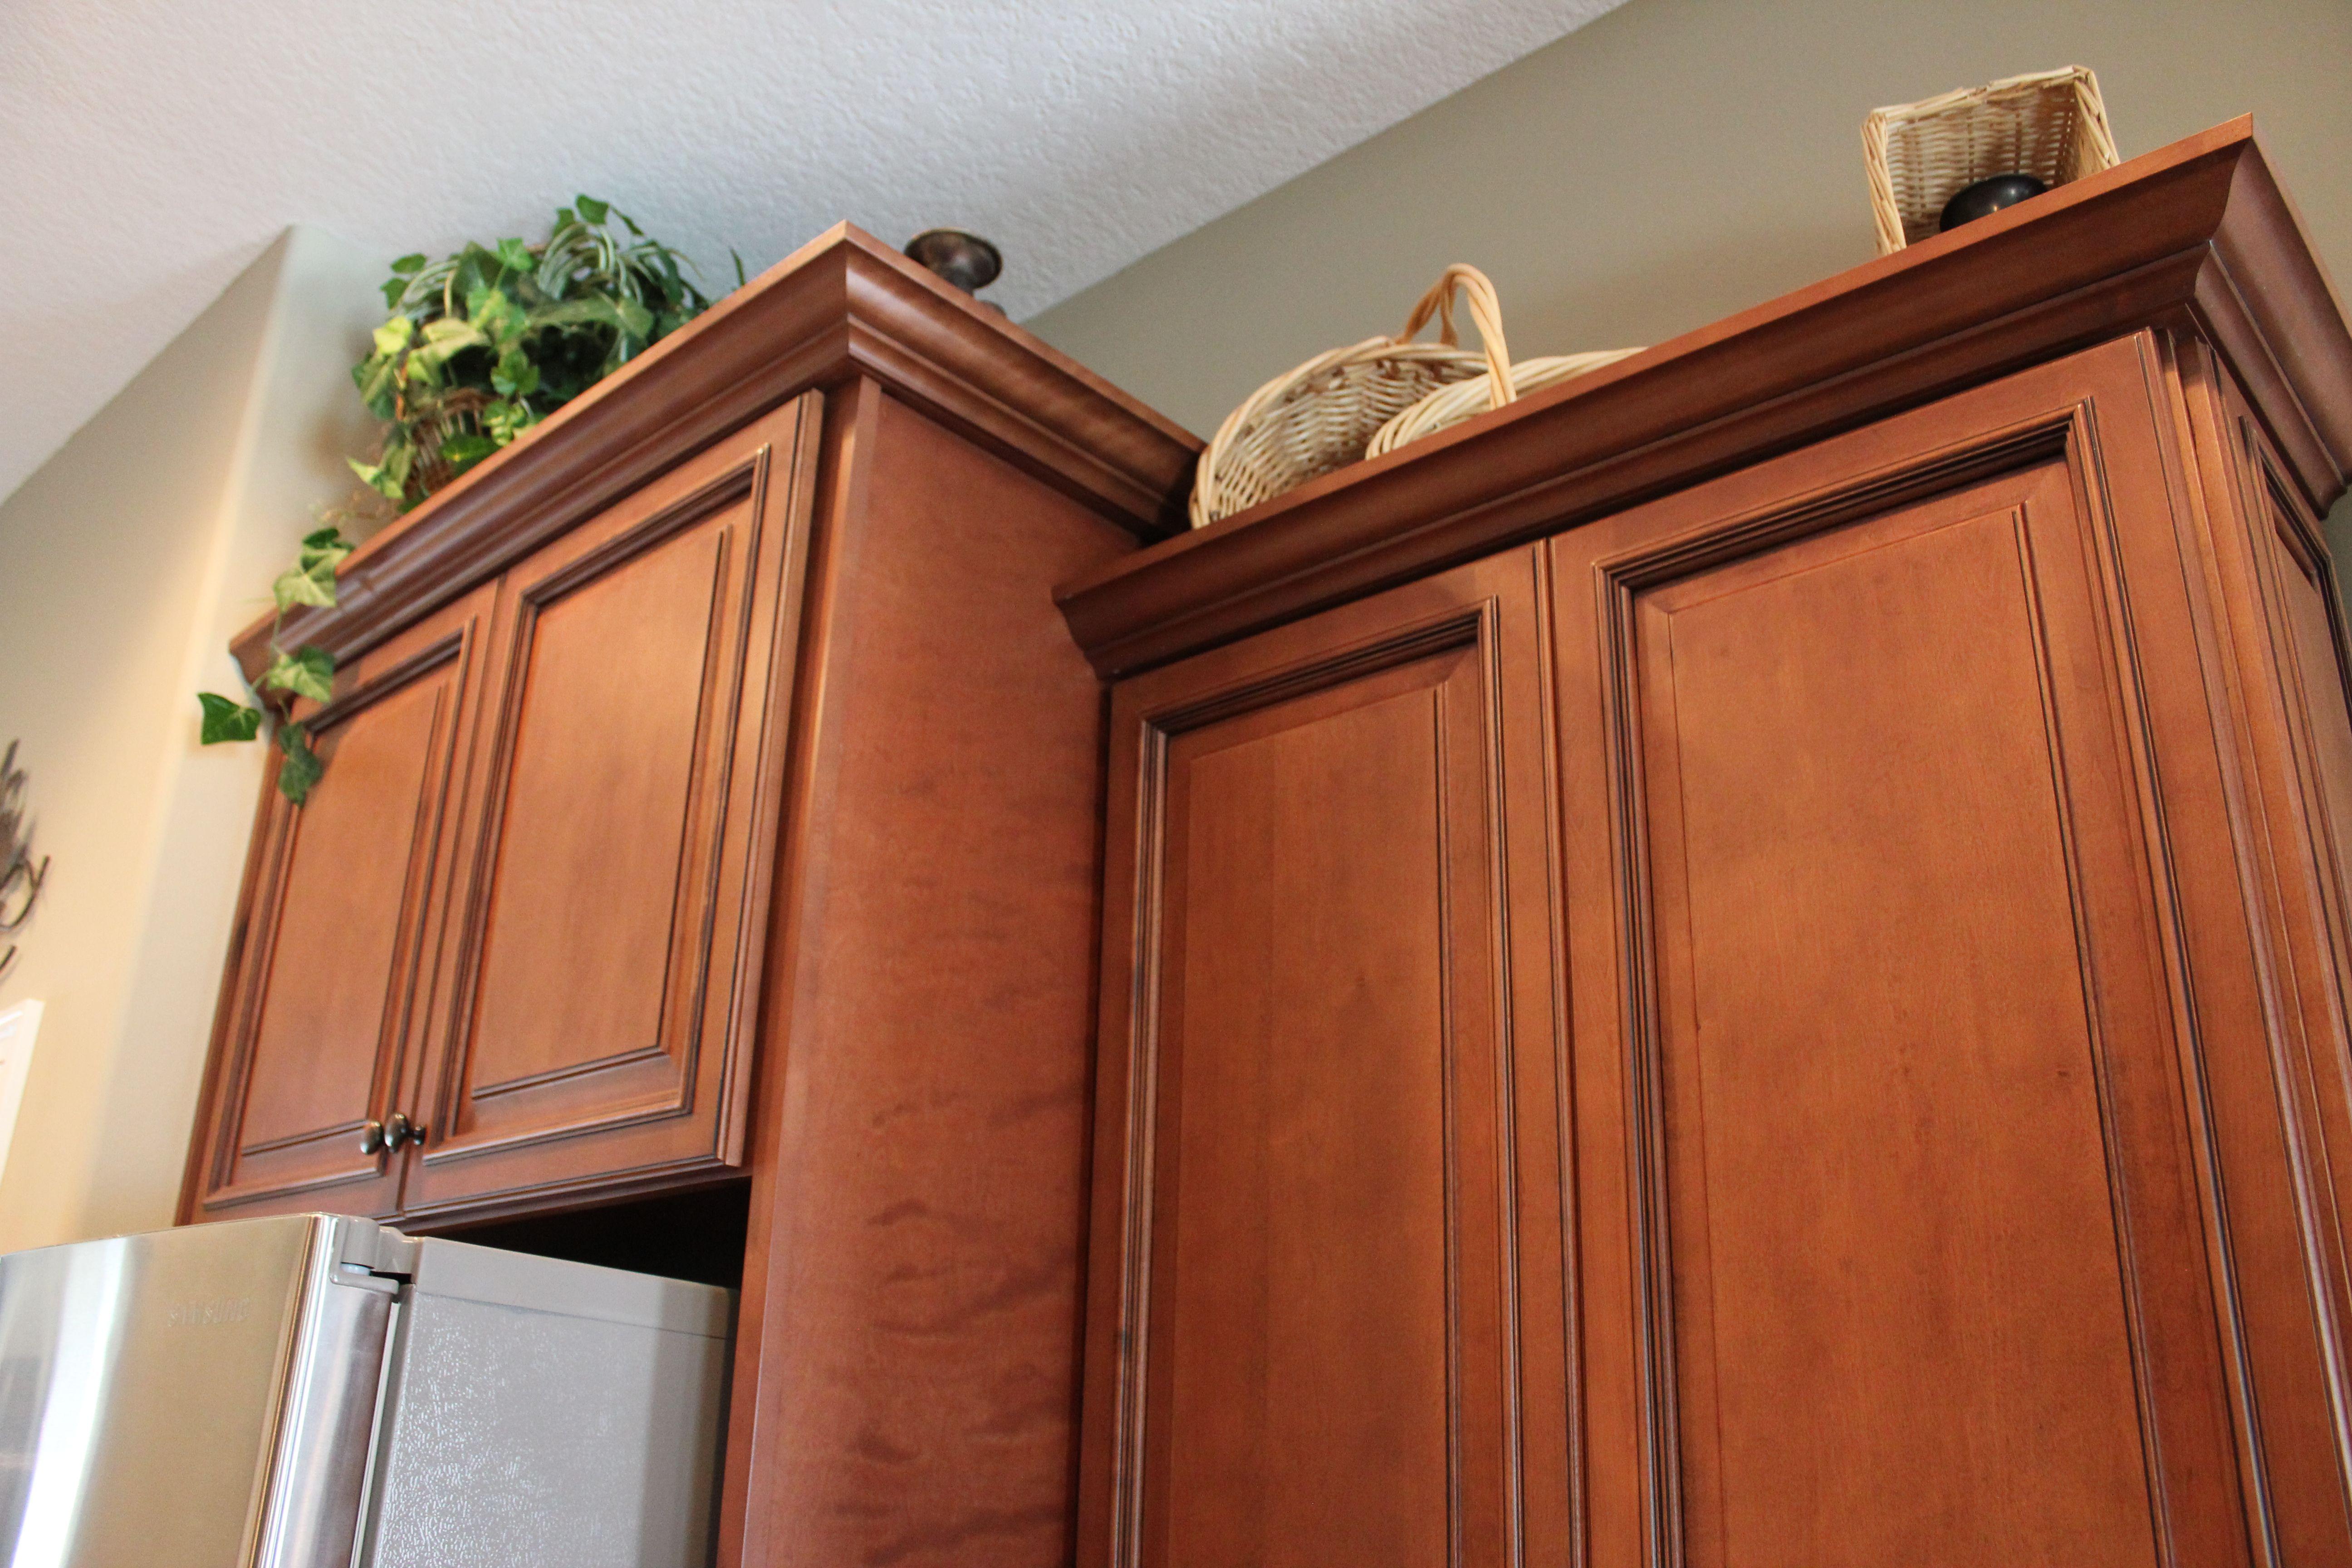 Fabuwood Cabinetry Wellington Door Style Cinnamon Glaze Raised Center Panels Kitc Cabinet Molding Kitchen Cabinet Crown Molding Cabinets With Crown Molding